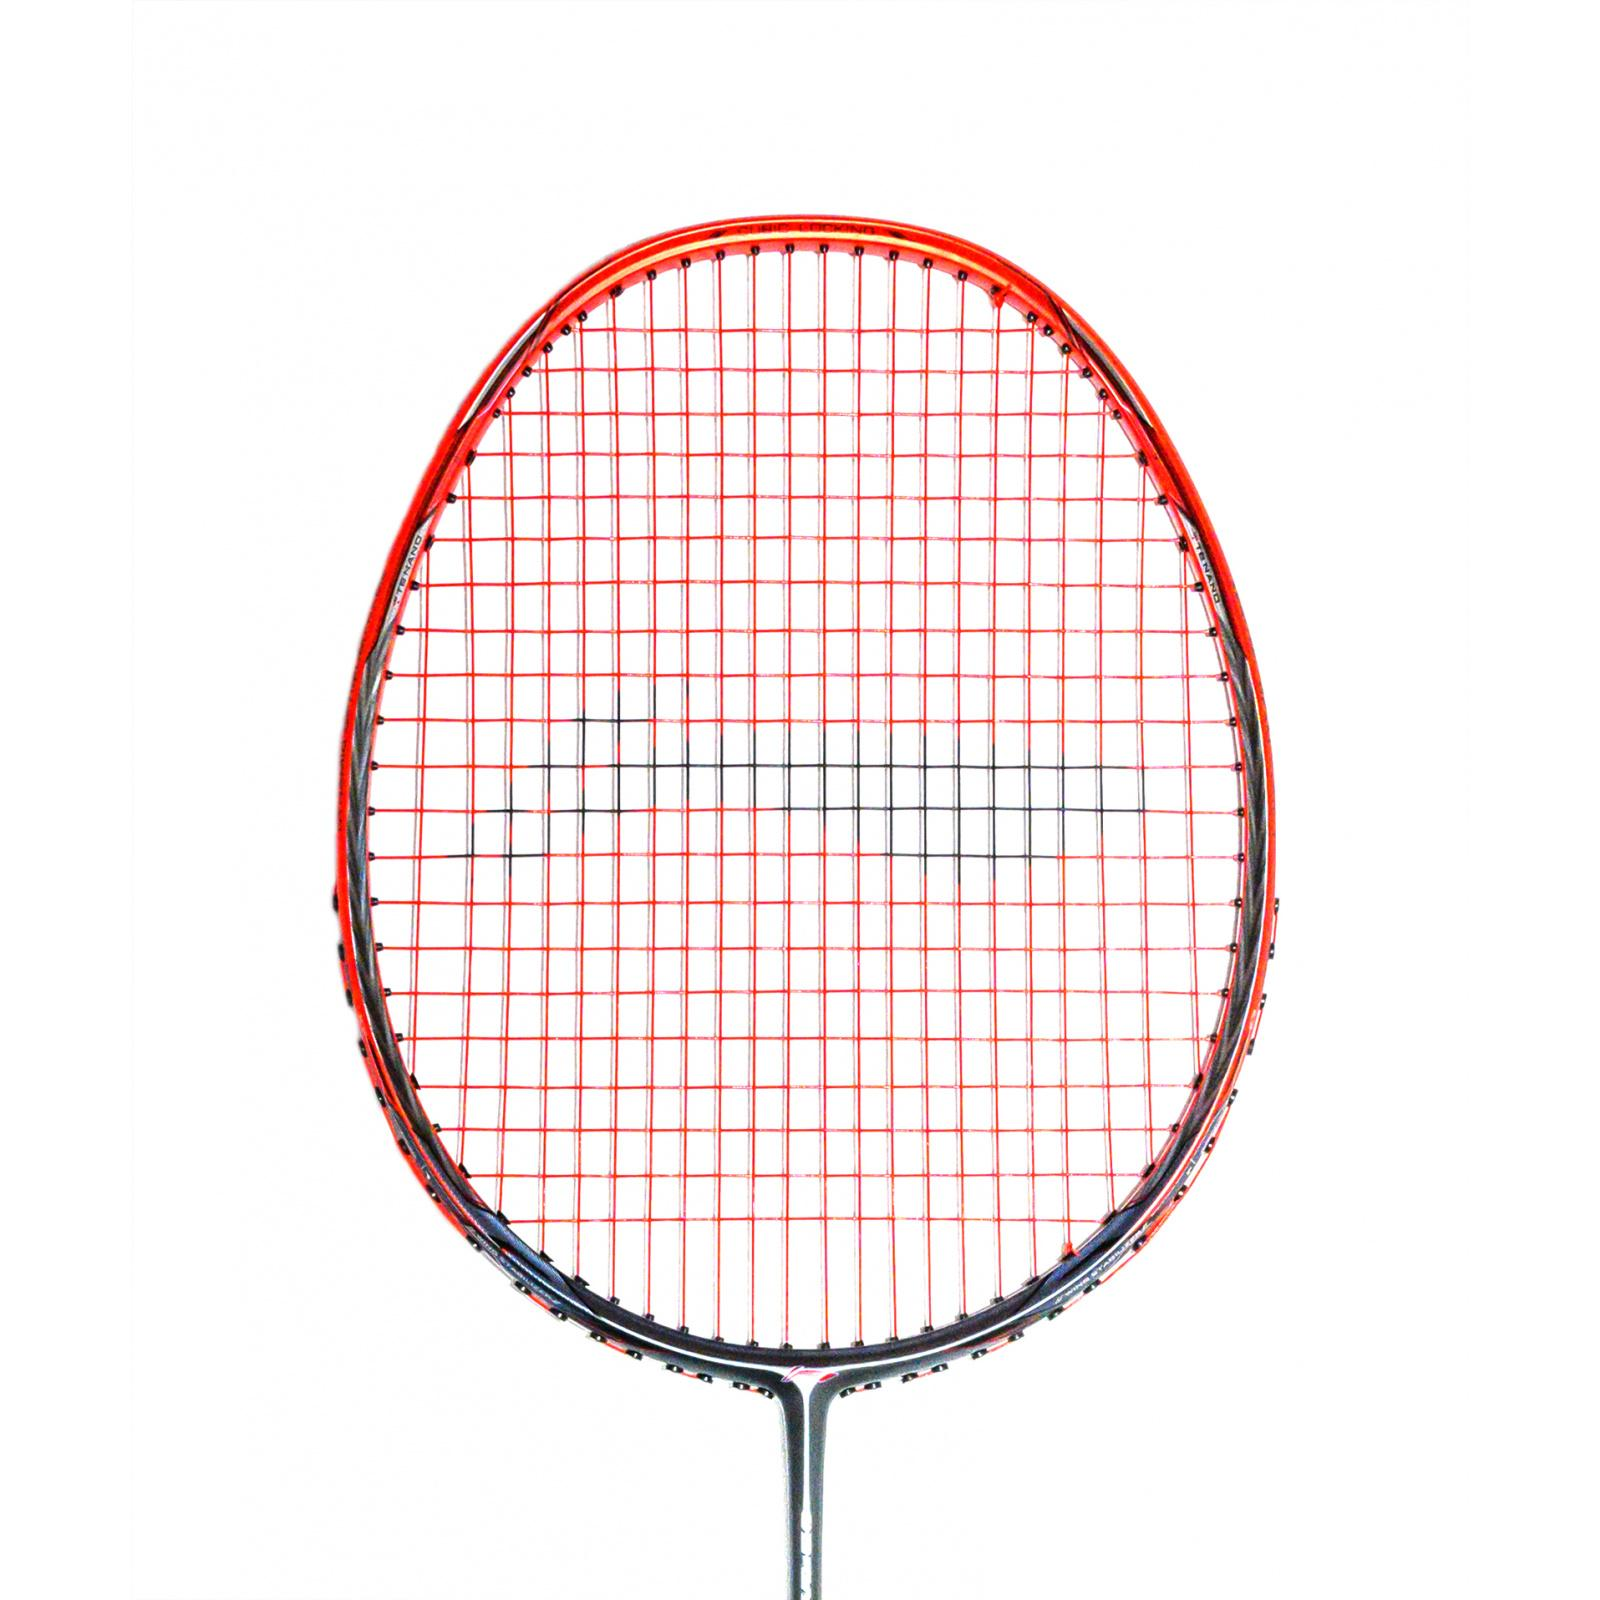 https://www.badec.store/produkty_img/badmintonova-raketa1570652879L.jpg